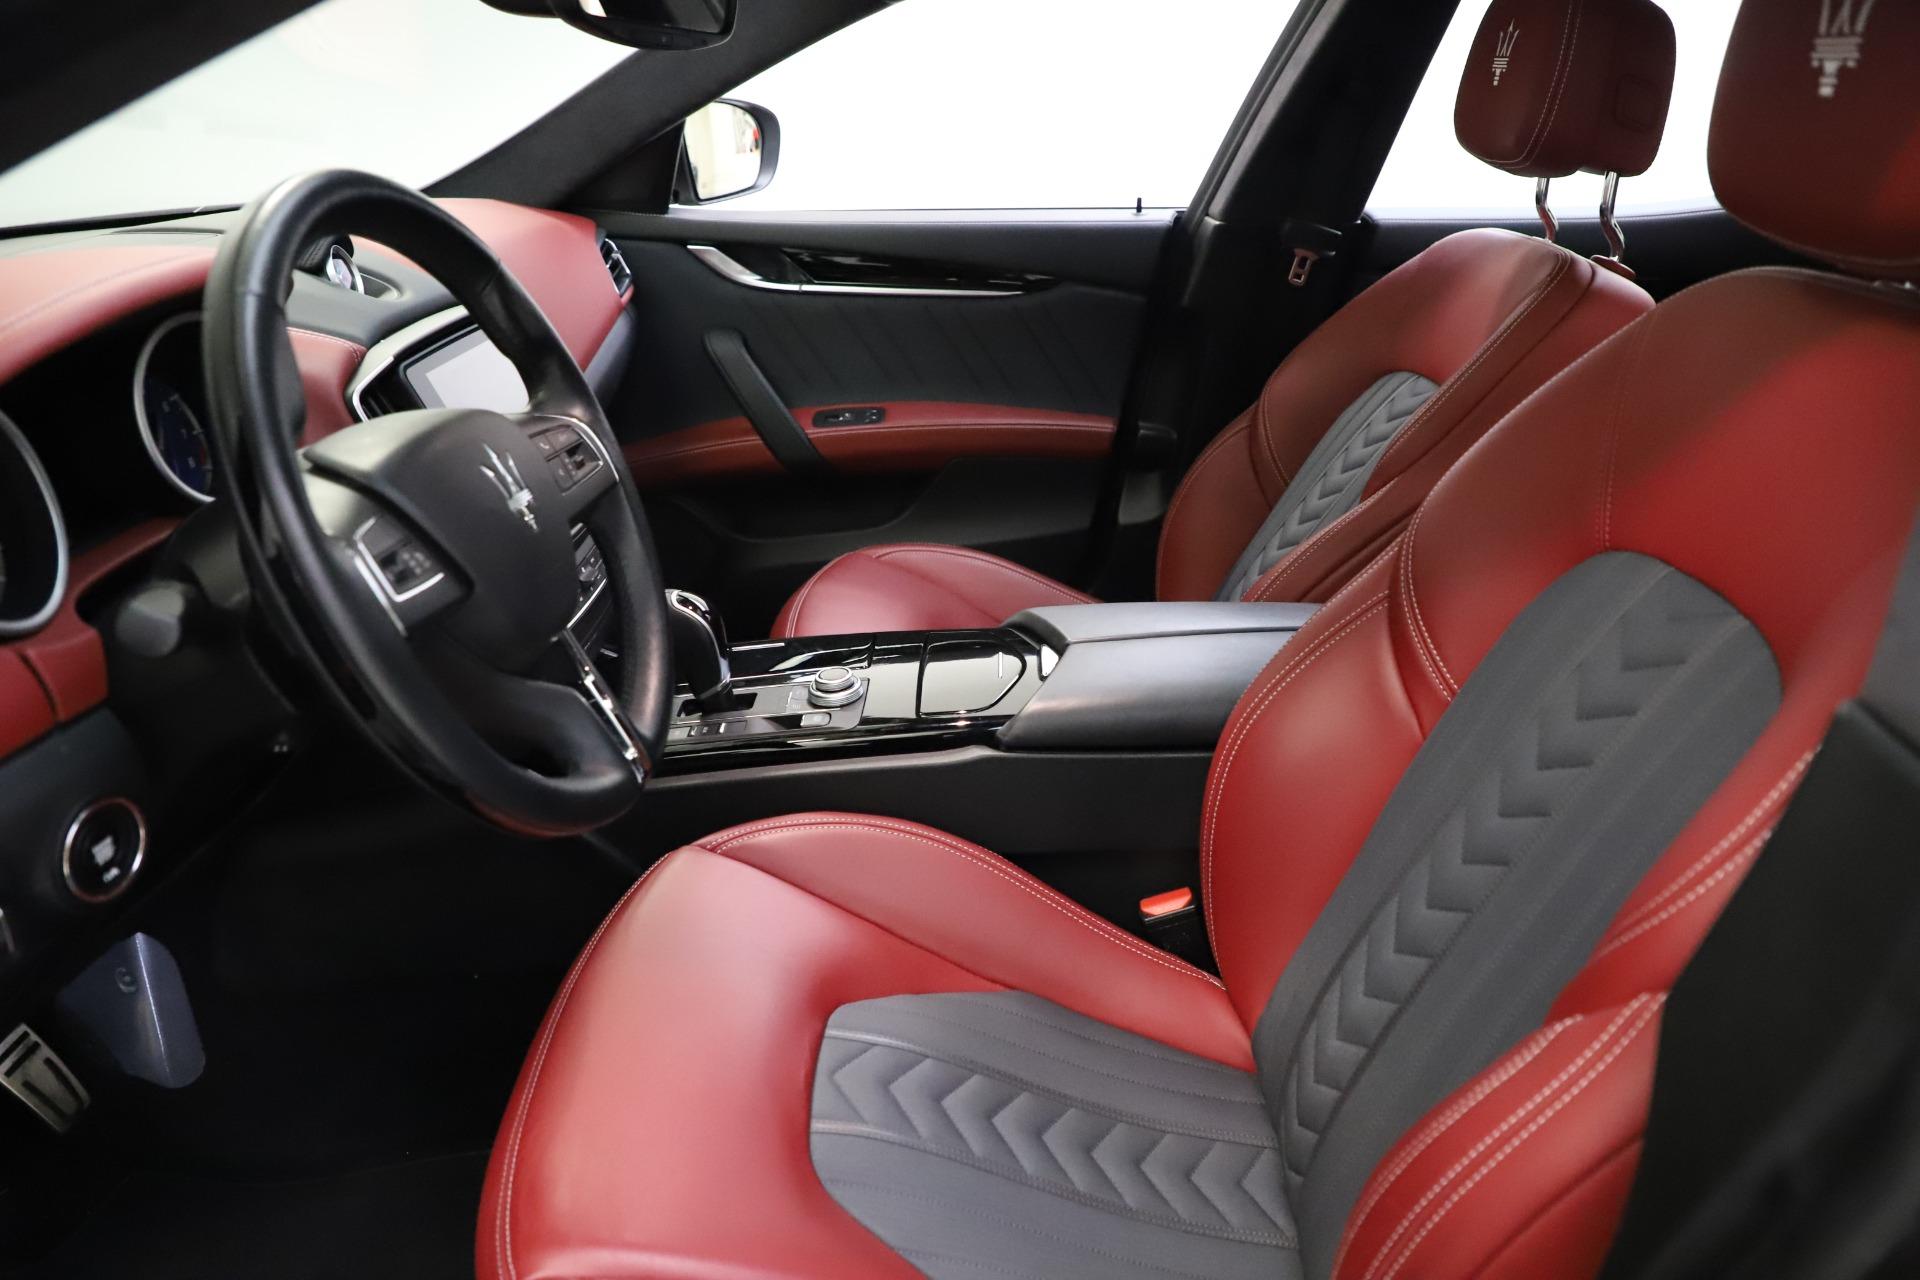 Used 2018 Maserati Ghibli SQ4 GranLusso